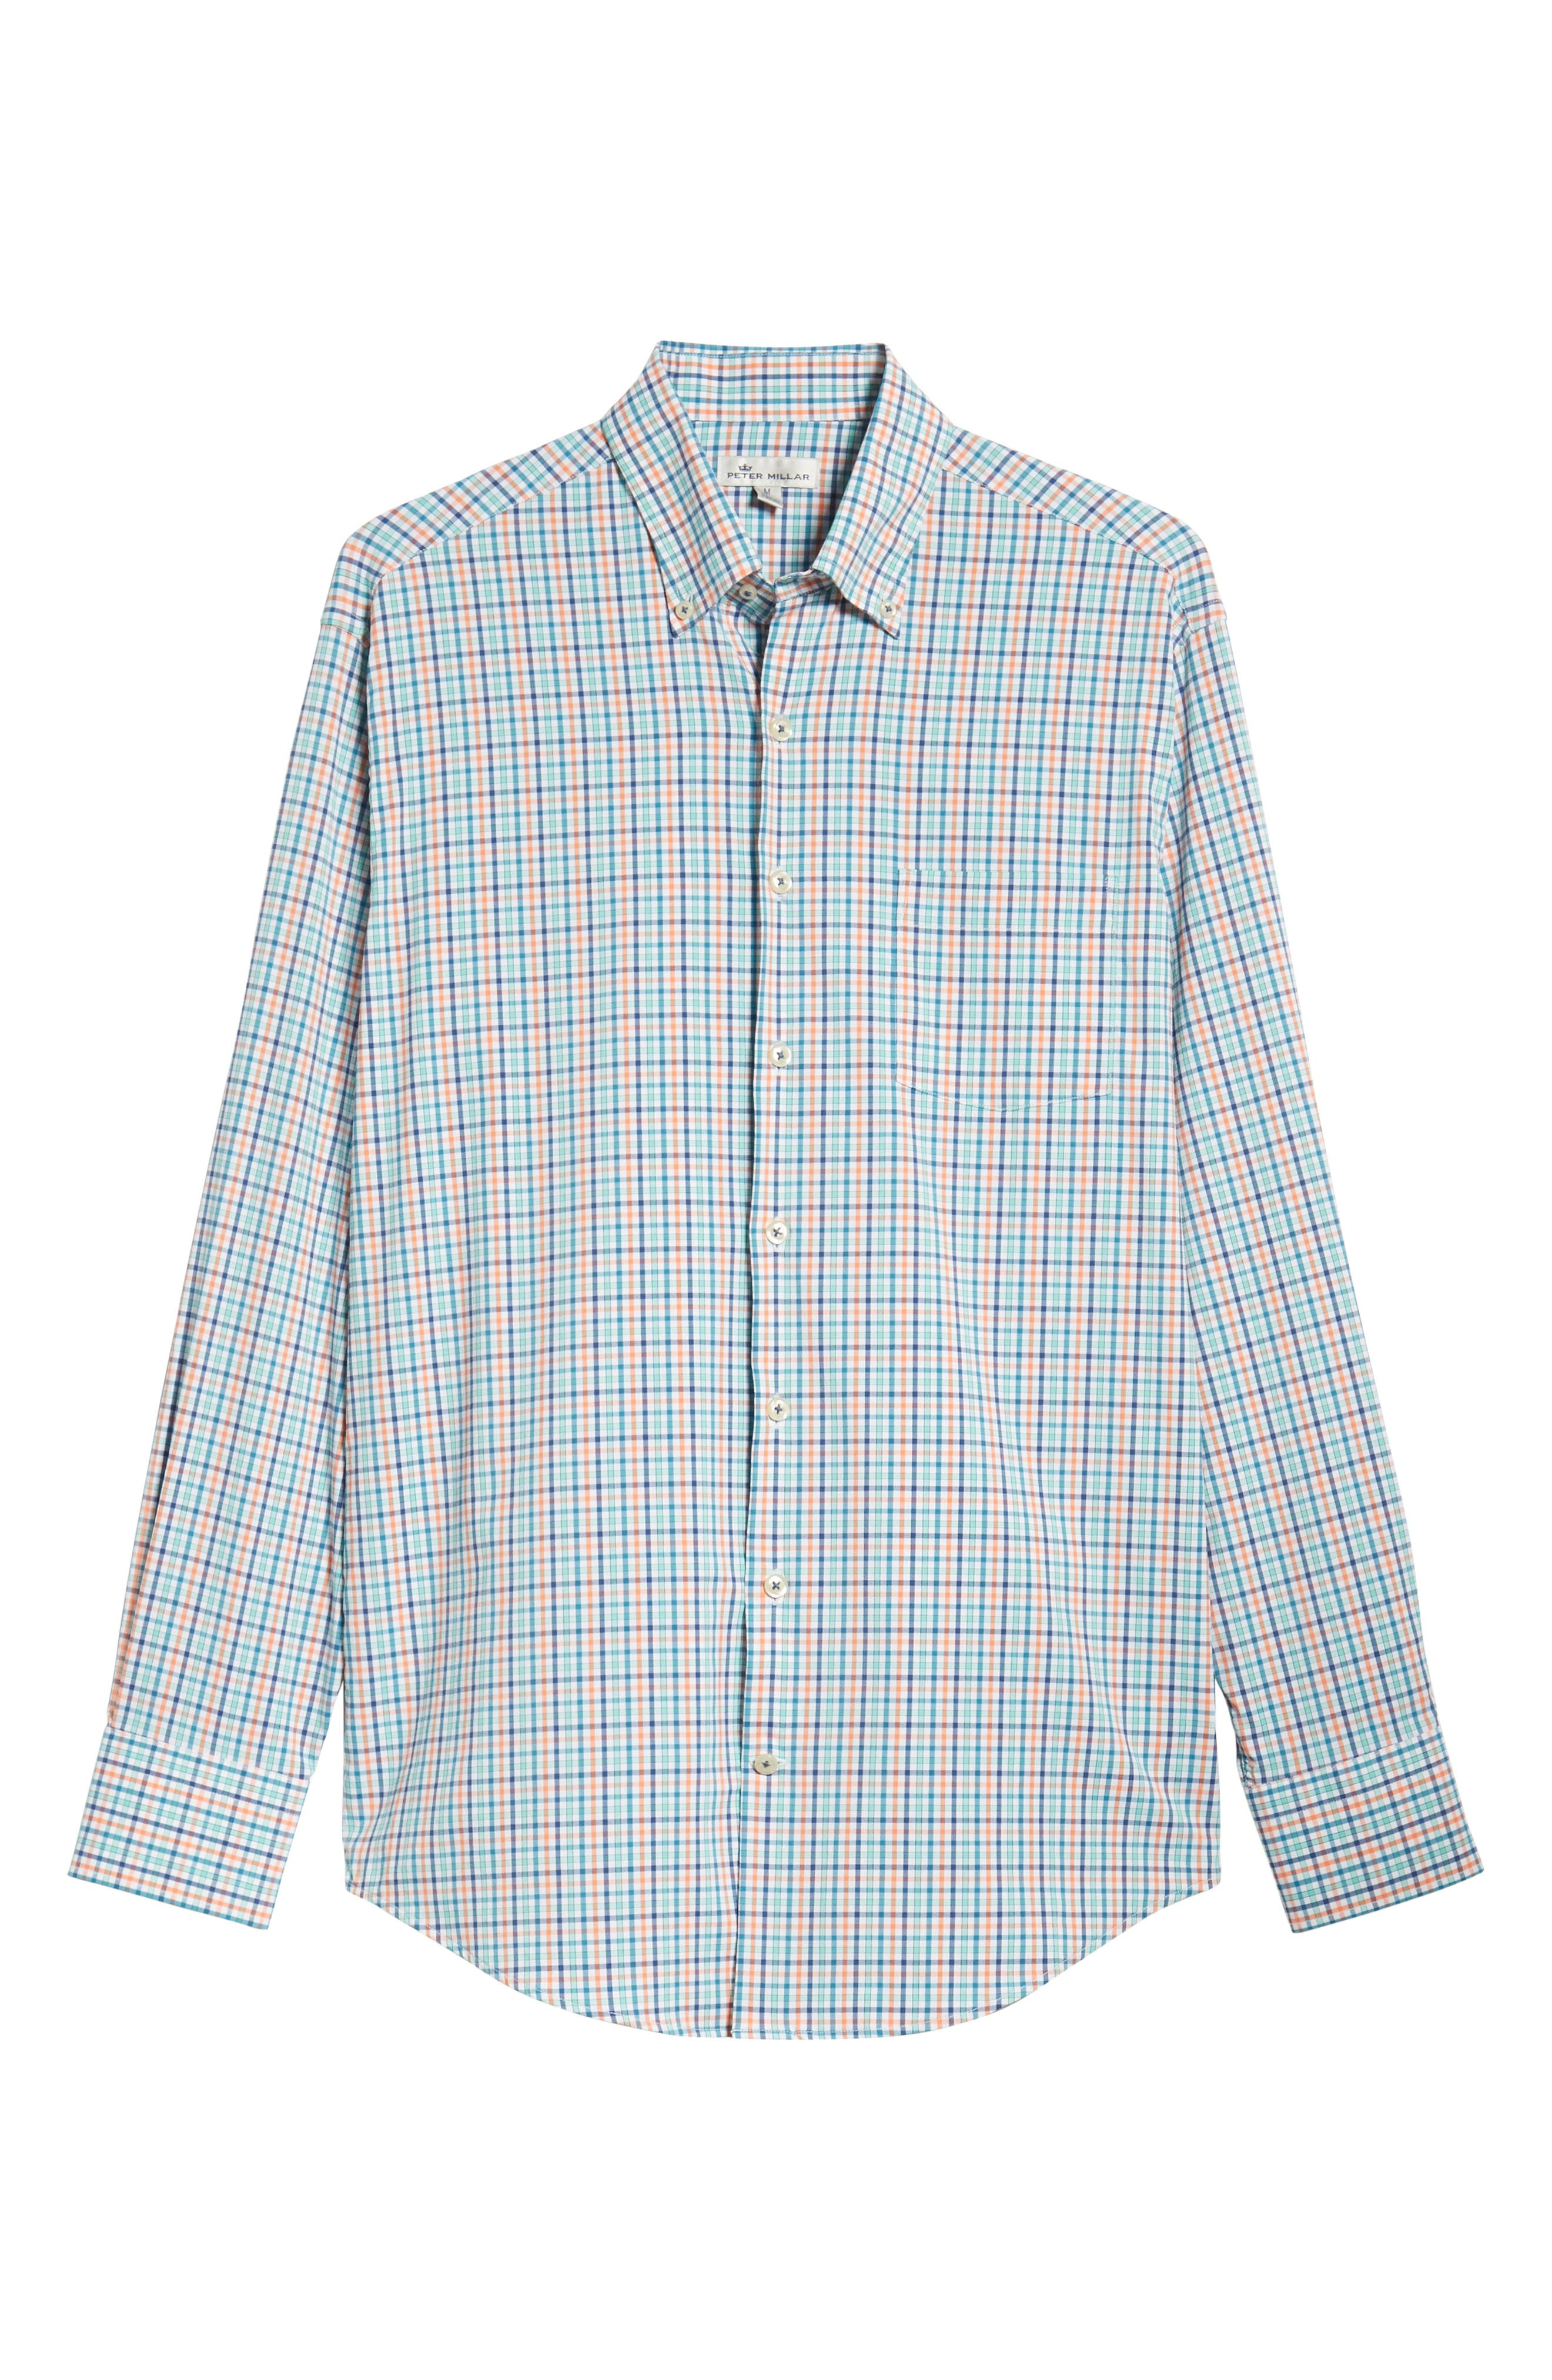 Lawson Regular Fit Tattersall Check Performance Sport Shirt,                             Alternate thumbnail 5, color,                             BLUE